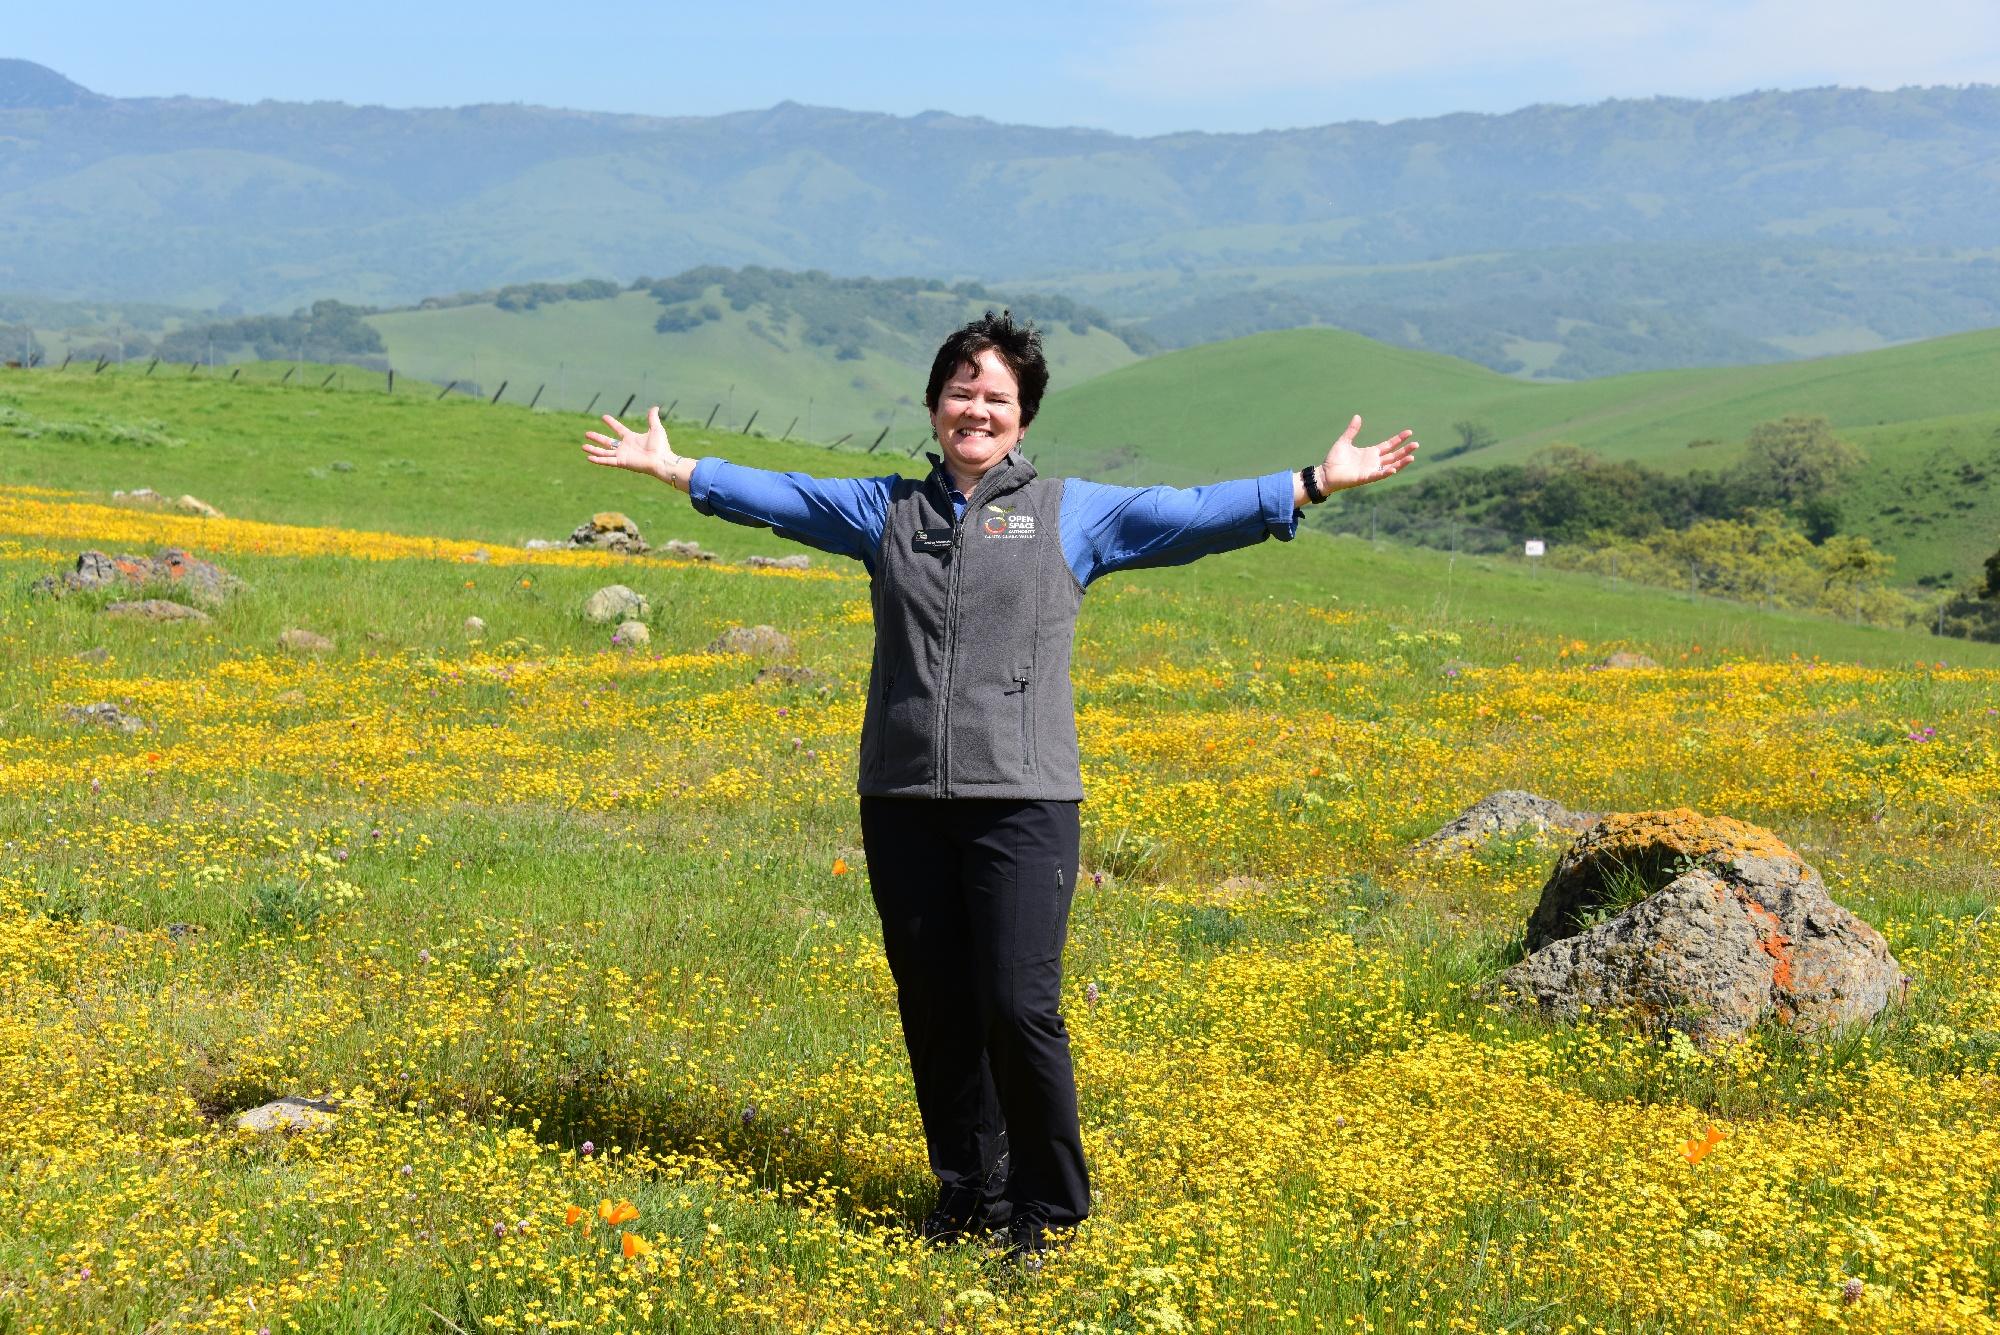 Andrea_wildflowers_Coyote Ridge Celebration - SA - 3-18-16 - 3-1